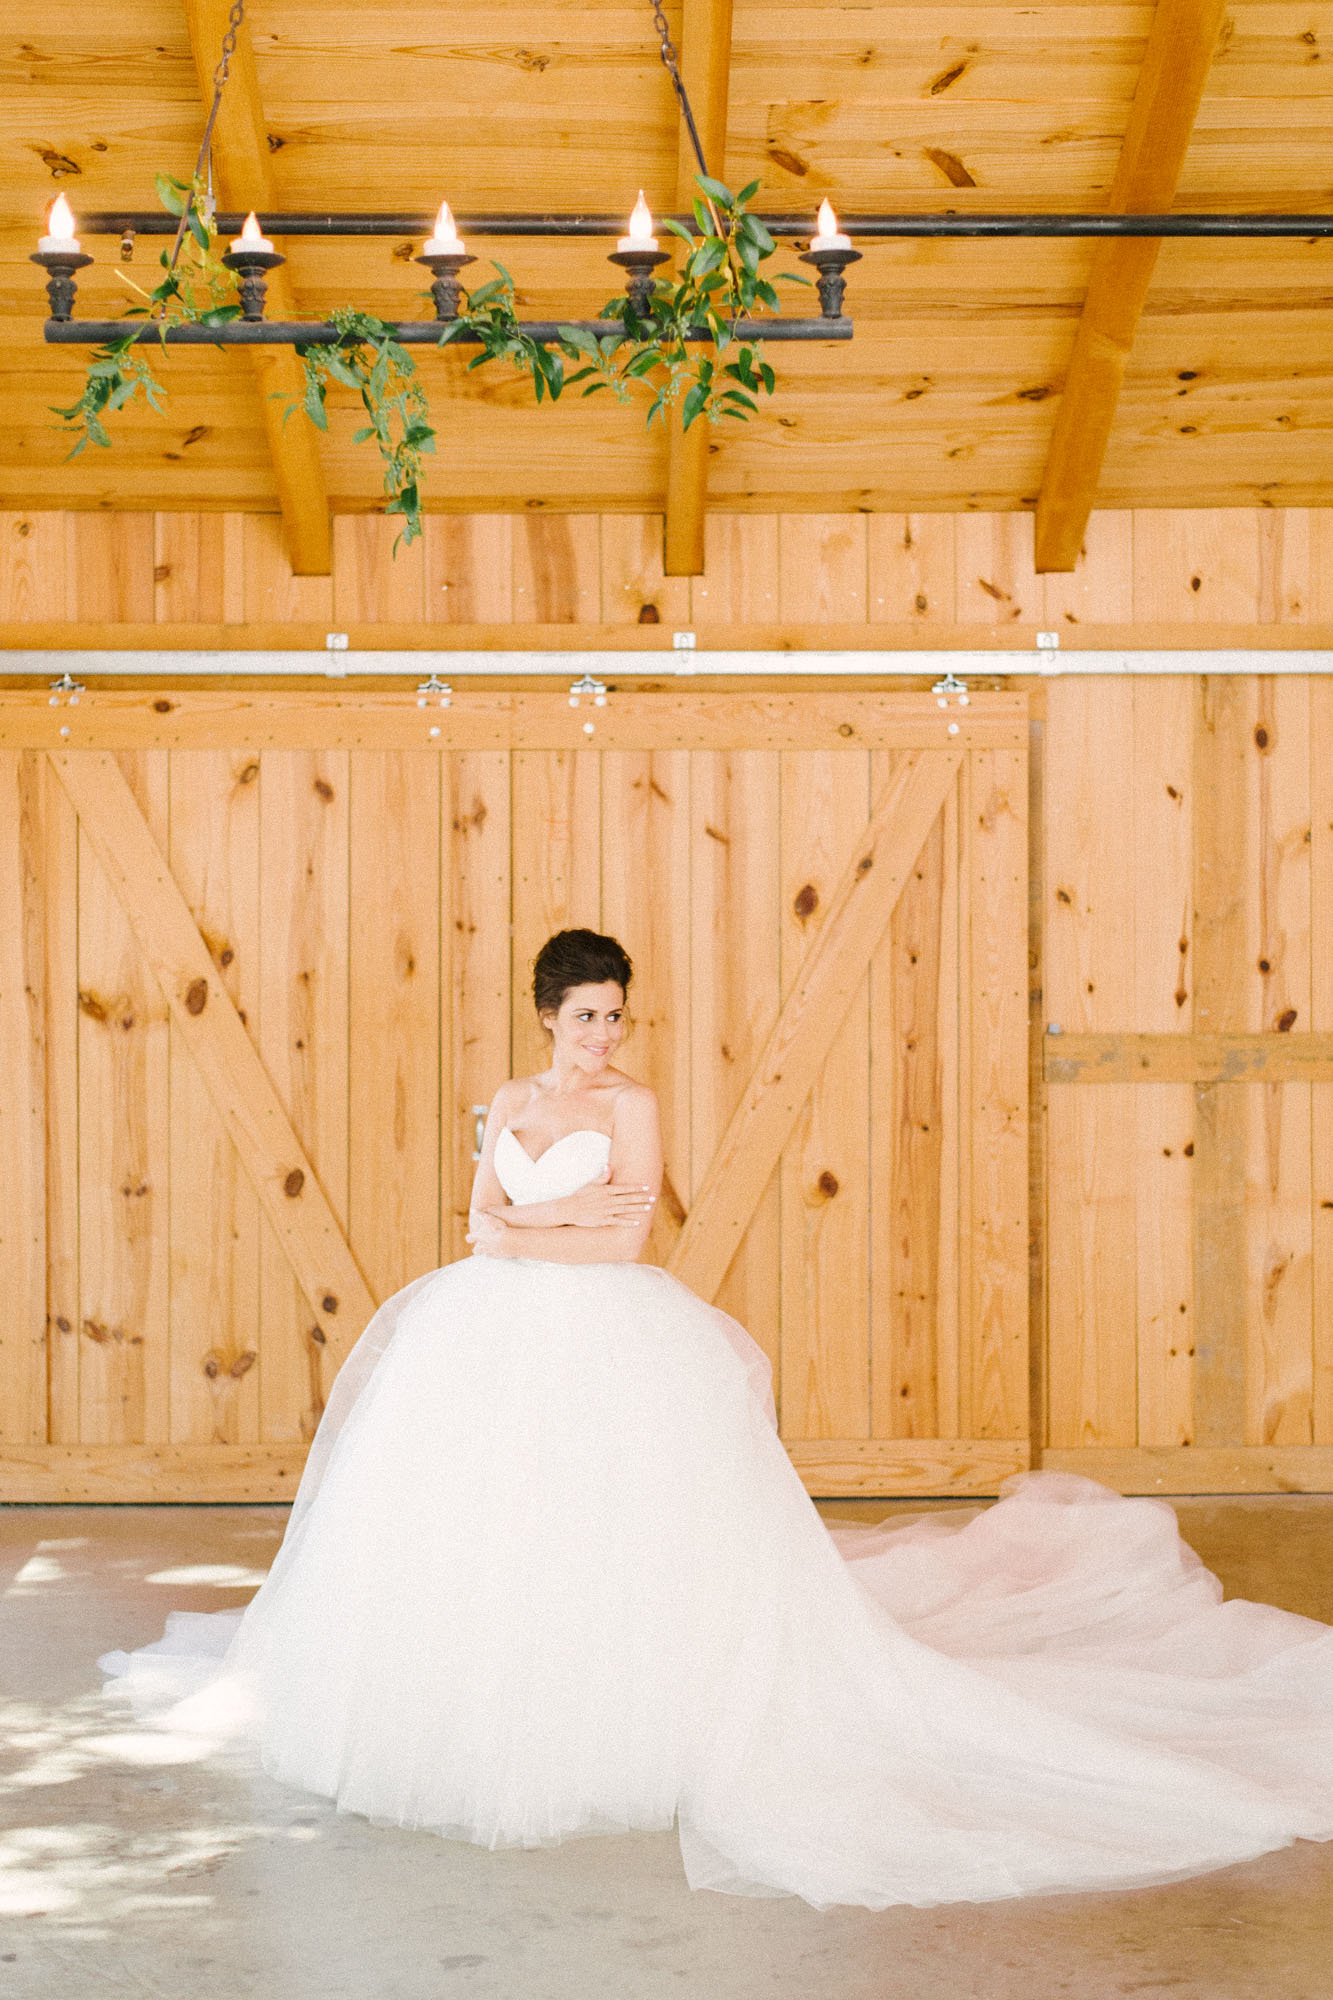 SM anna smith photography wedding photographer venue wedding planner-158.jpg